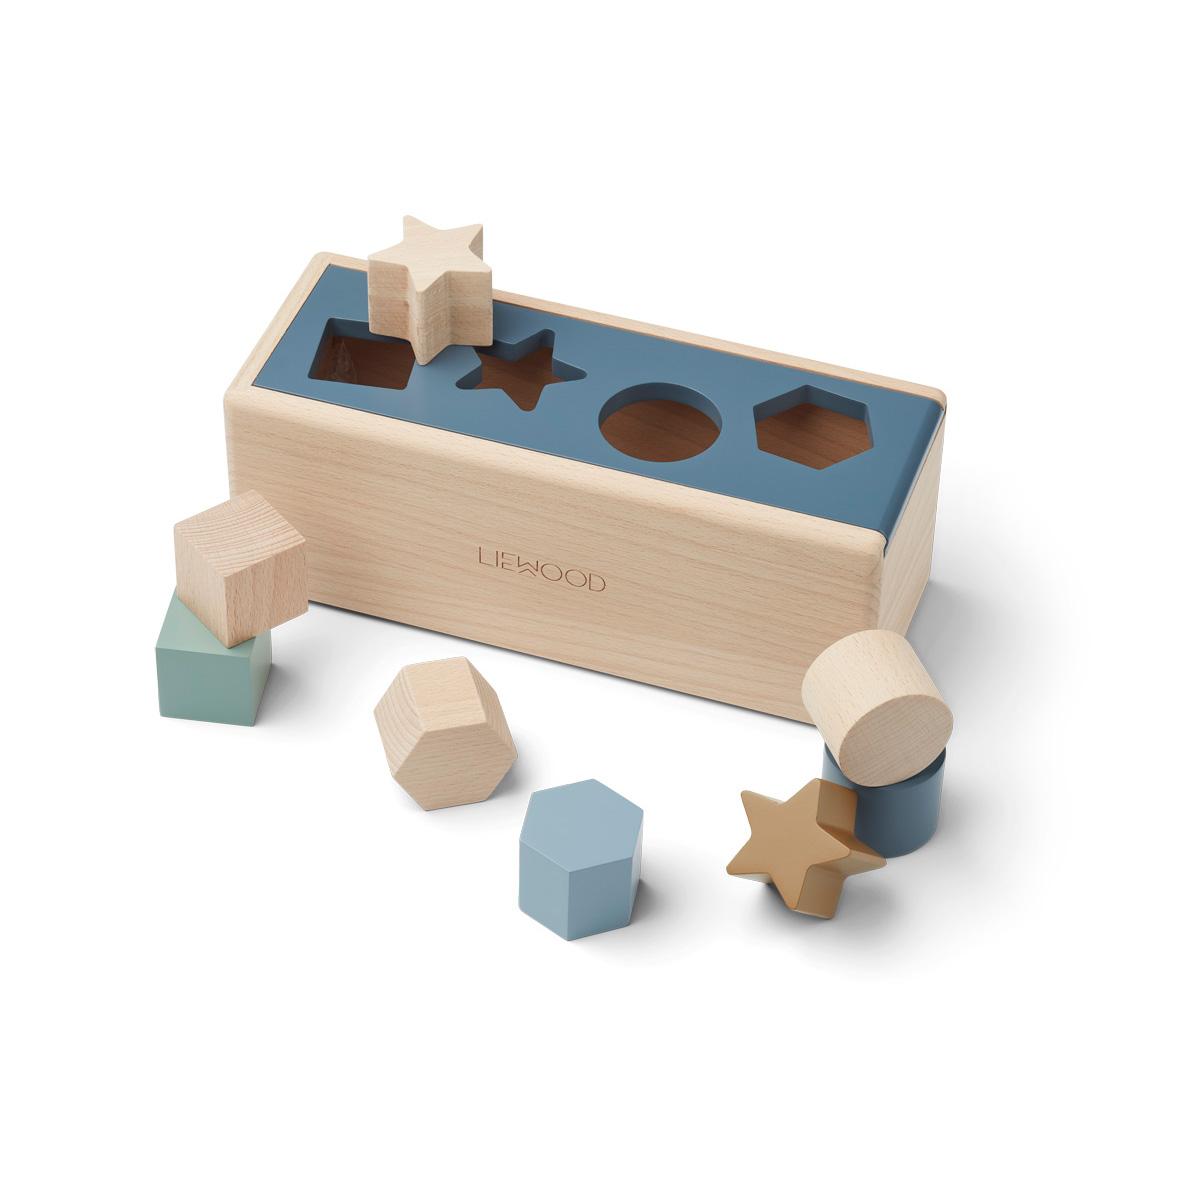 LIEWOOD Midas puzzle blue, geometry